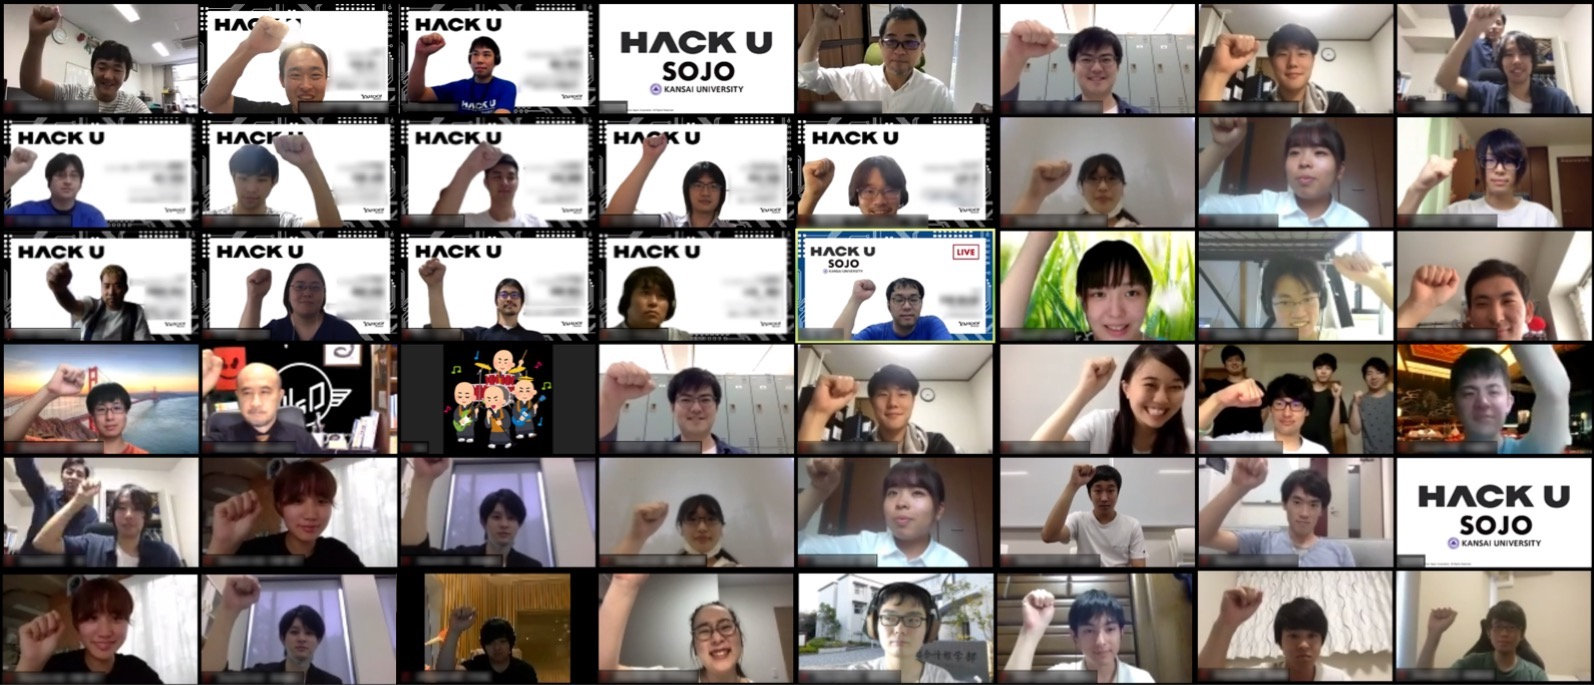 Hack U 関西大学 SOJO 2019